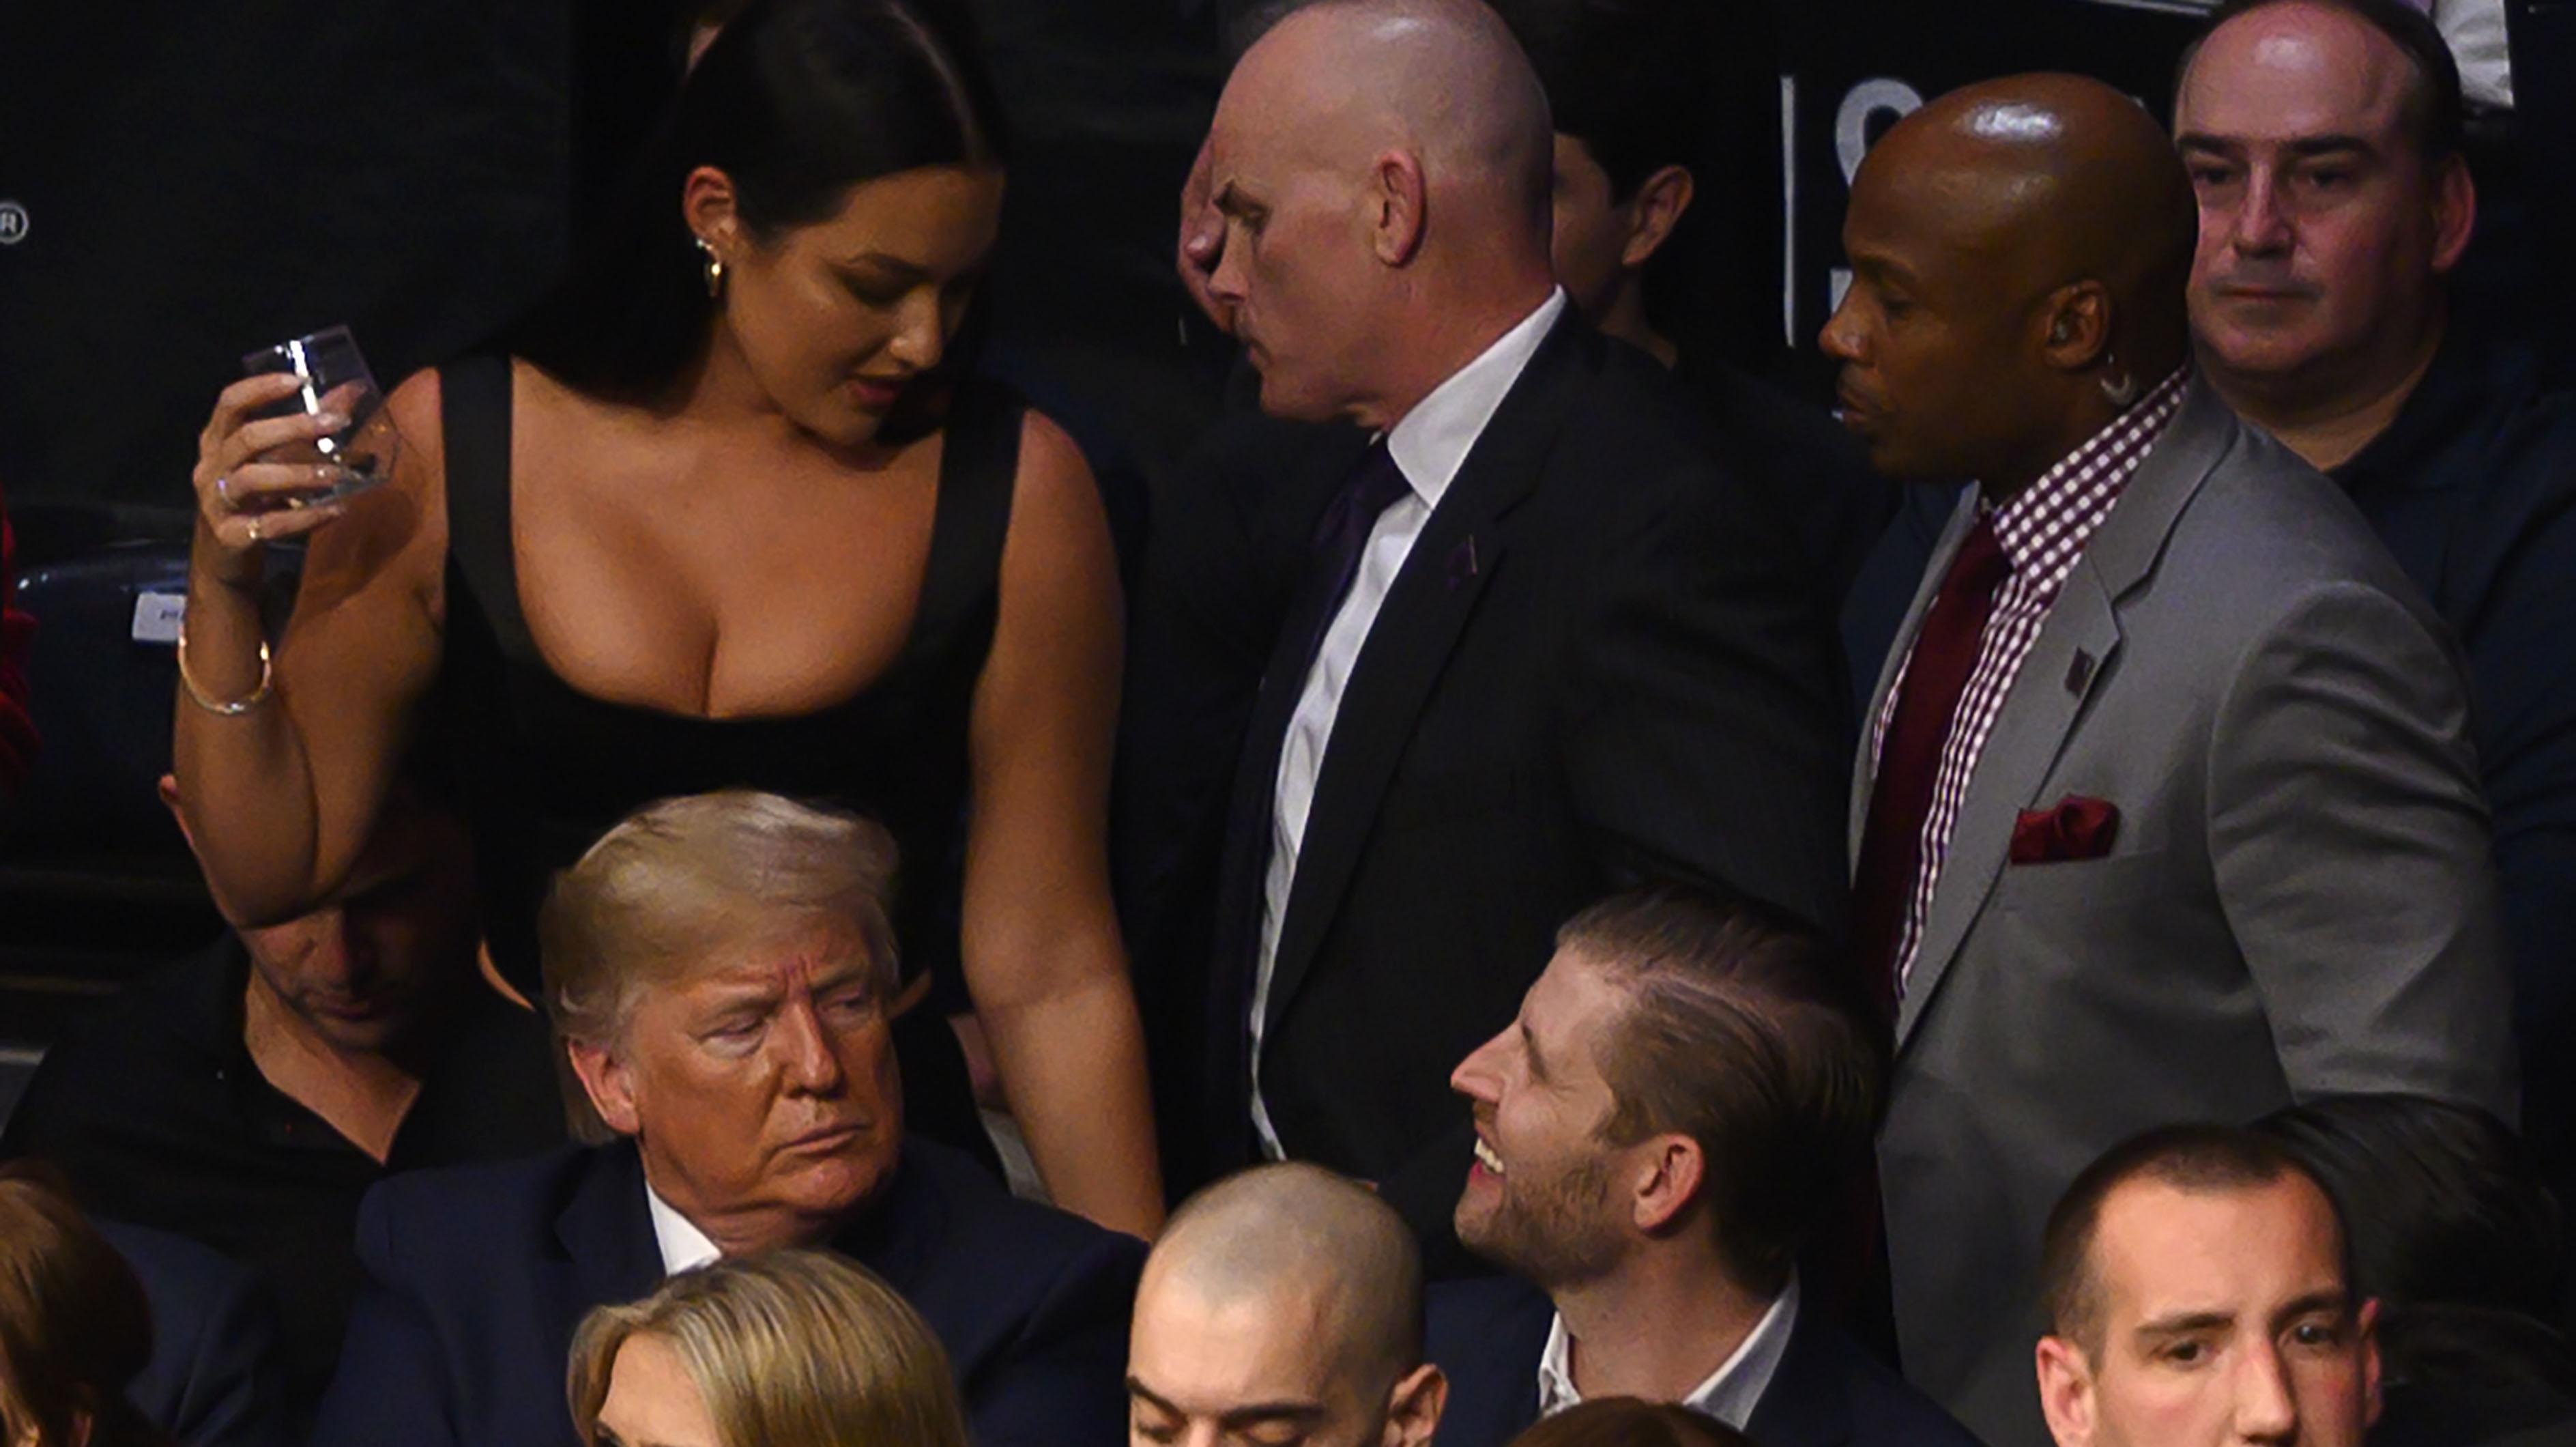 Trump booed at UFC fight night in New York